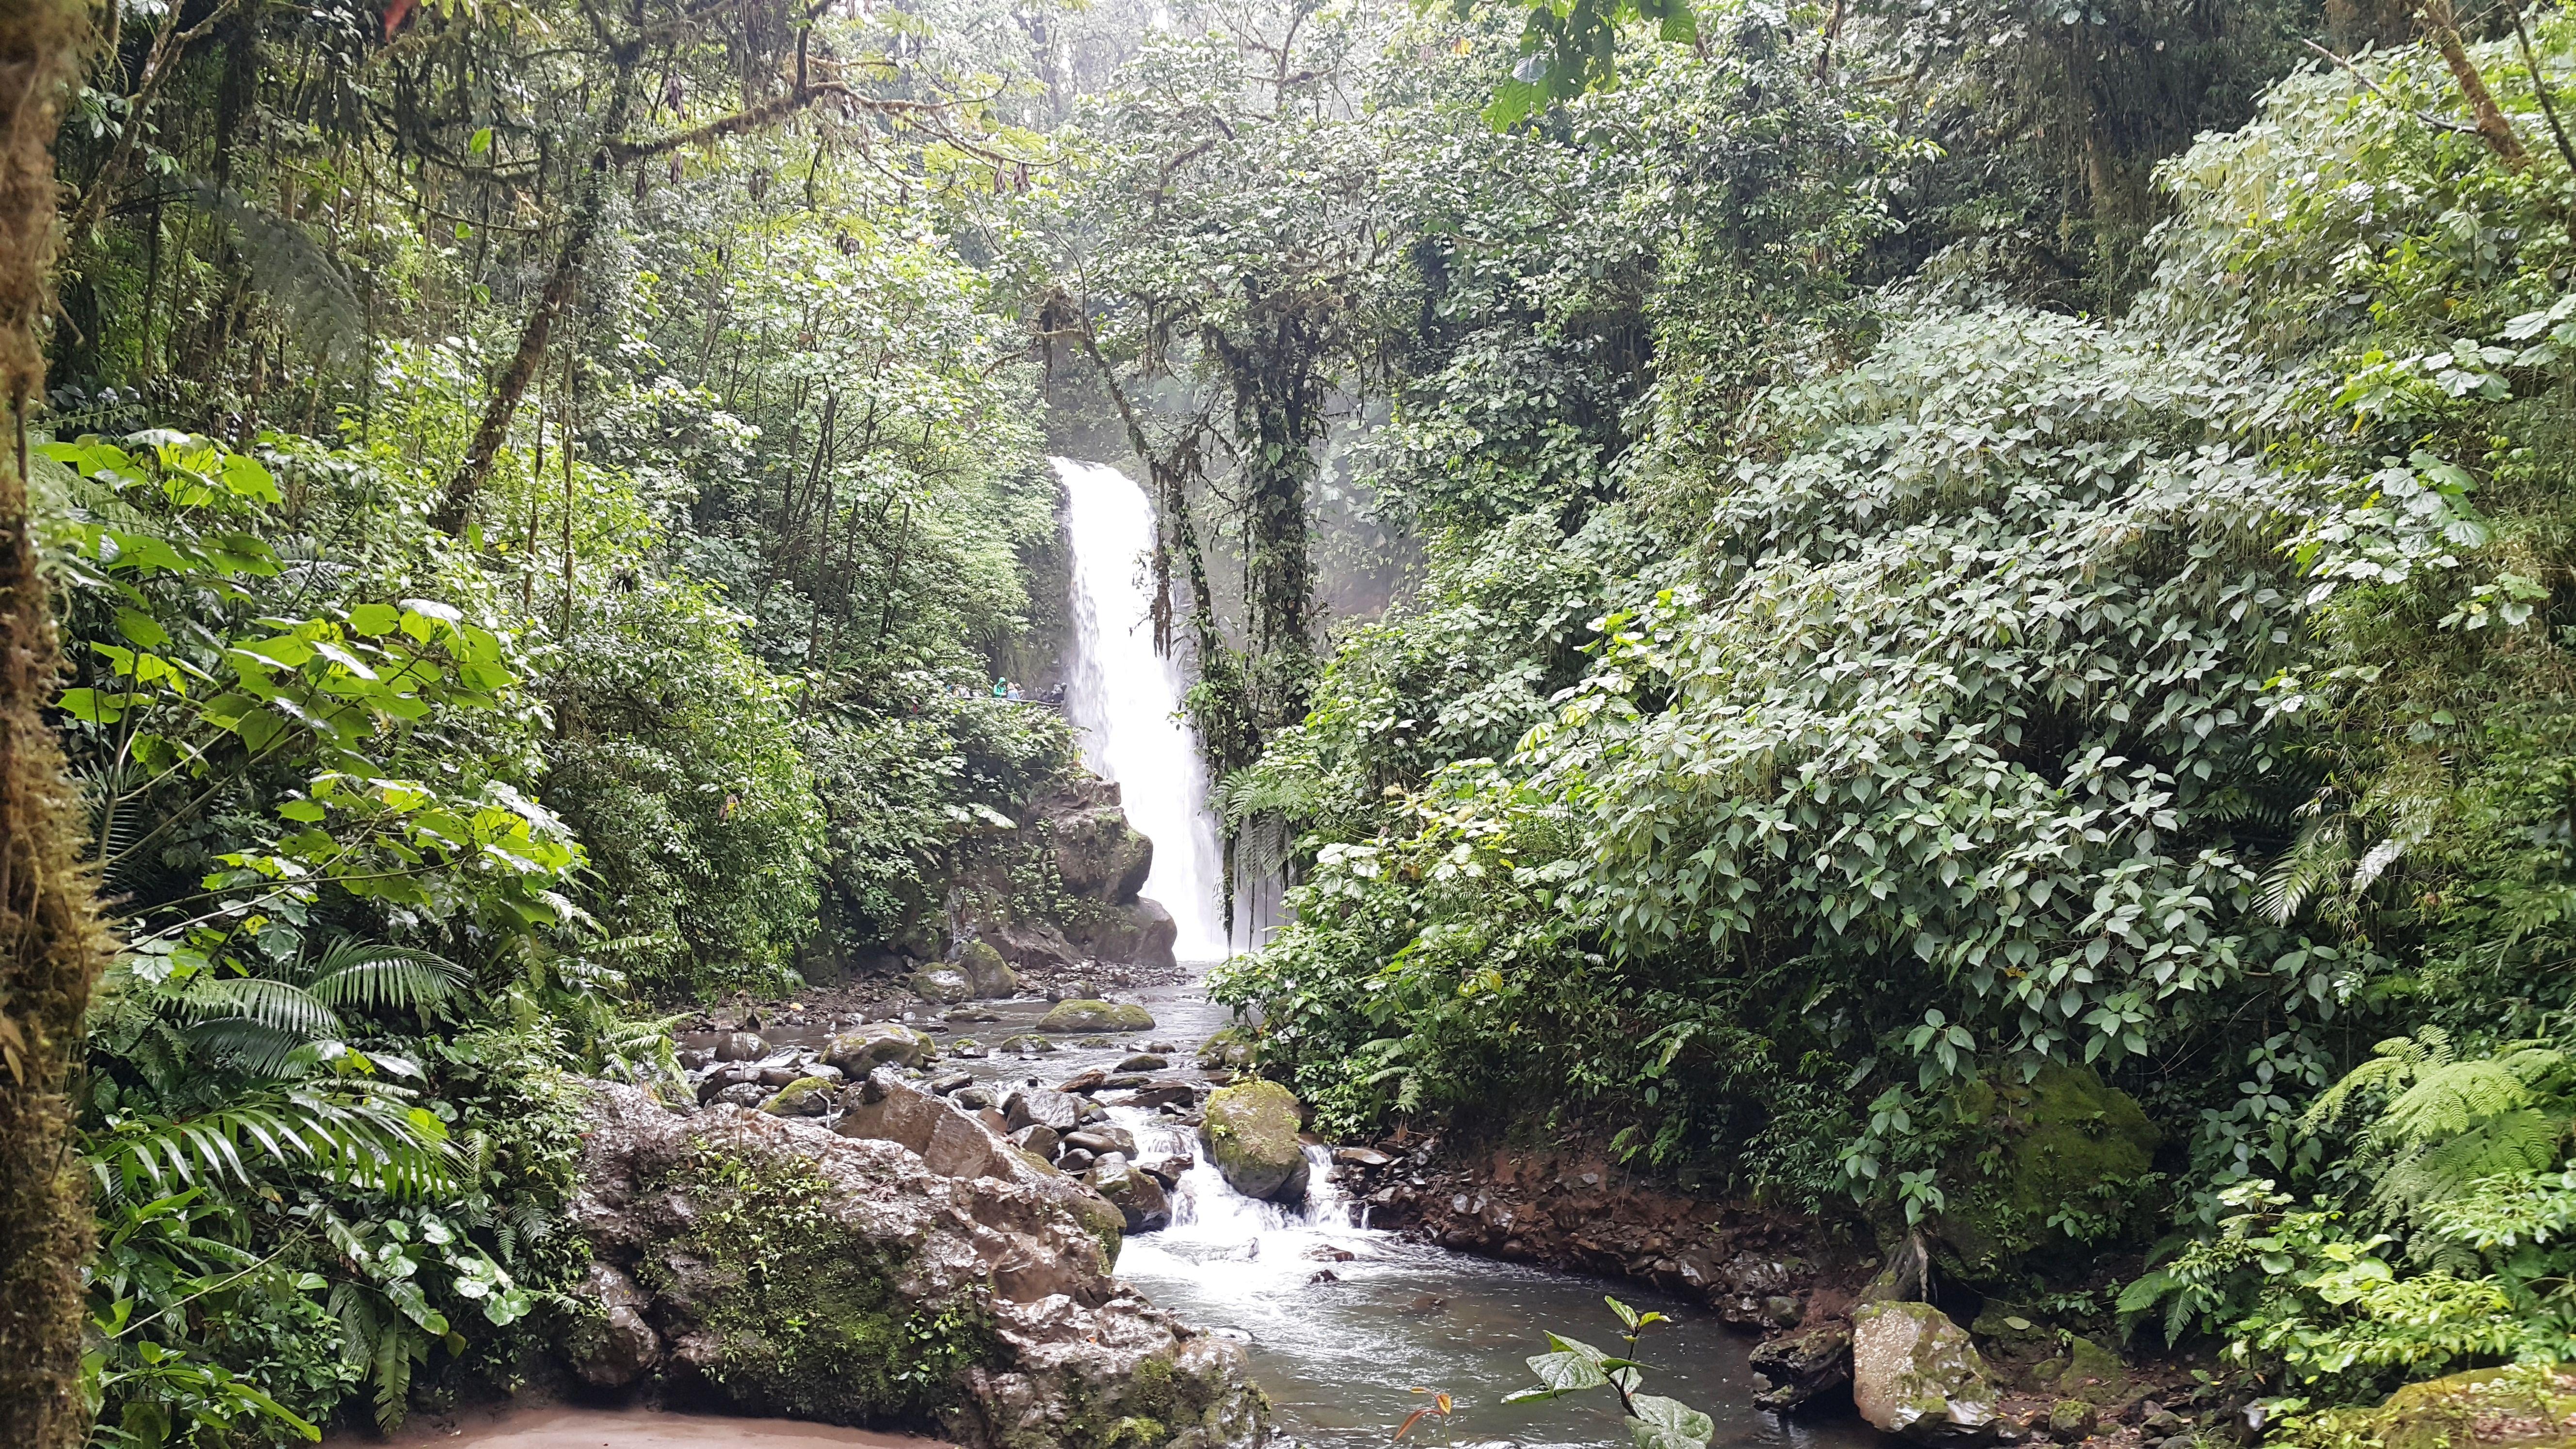 856780c4db3e91e595cc07a6158e3499 - La Paz Waterfall Gardens Tour From San Jose